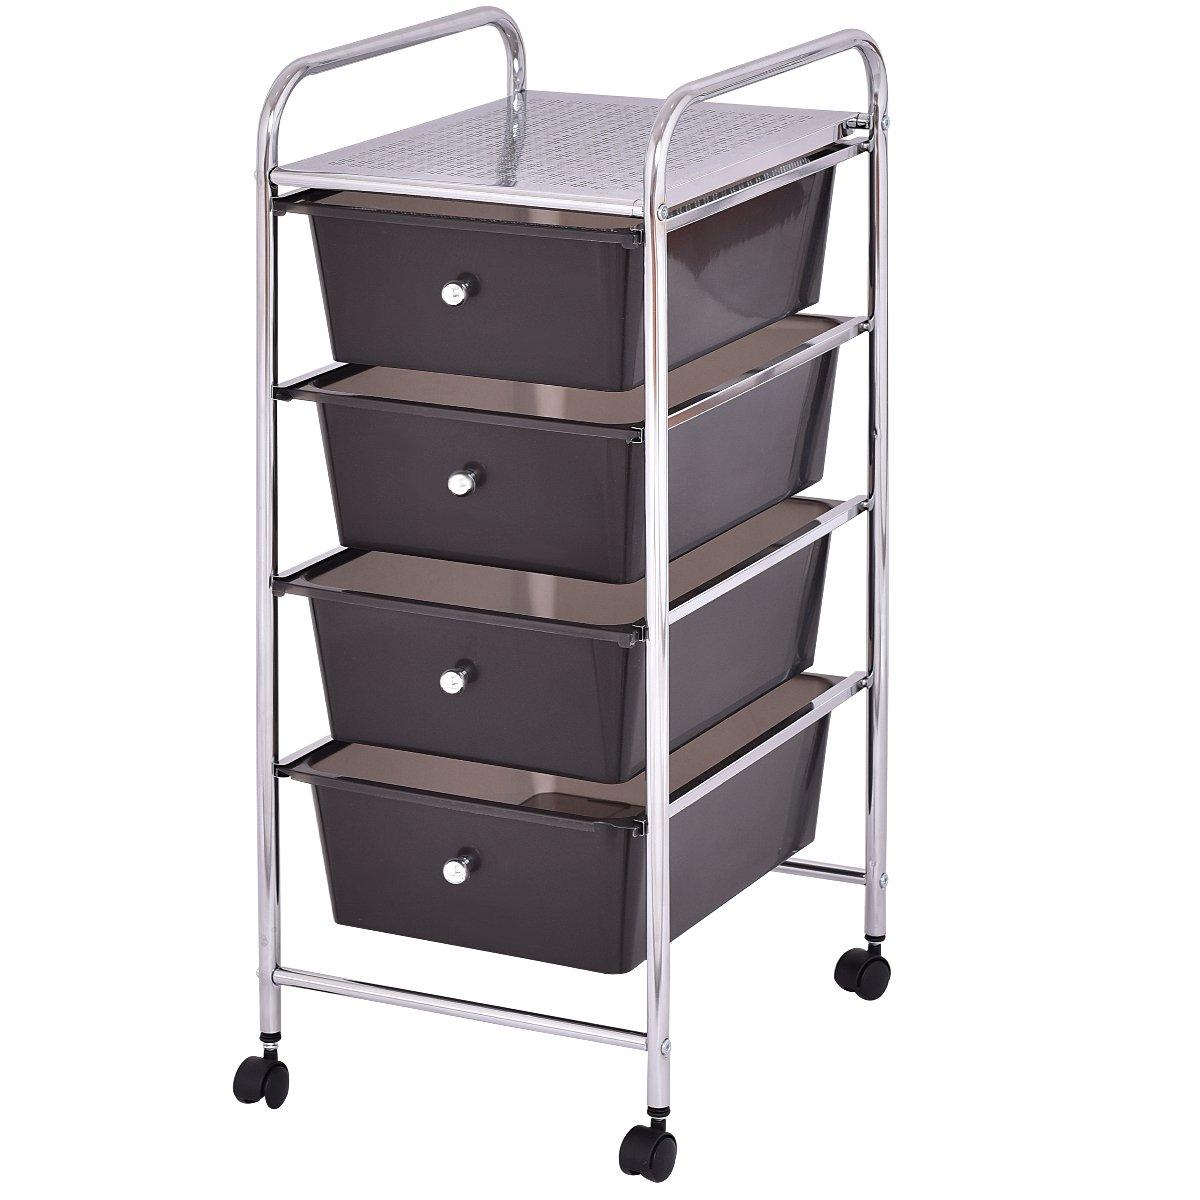 Giantex 4 Drawers Cart Storage Bin Organizer Rolling Storage Cart Metal Frame Plastic Drawers Flexible Wheels Home Office Scrapbook Supply & Paper Shelf